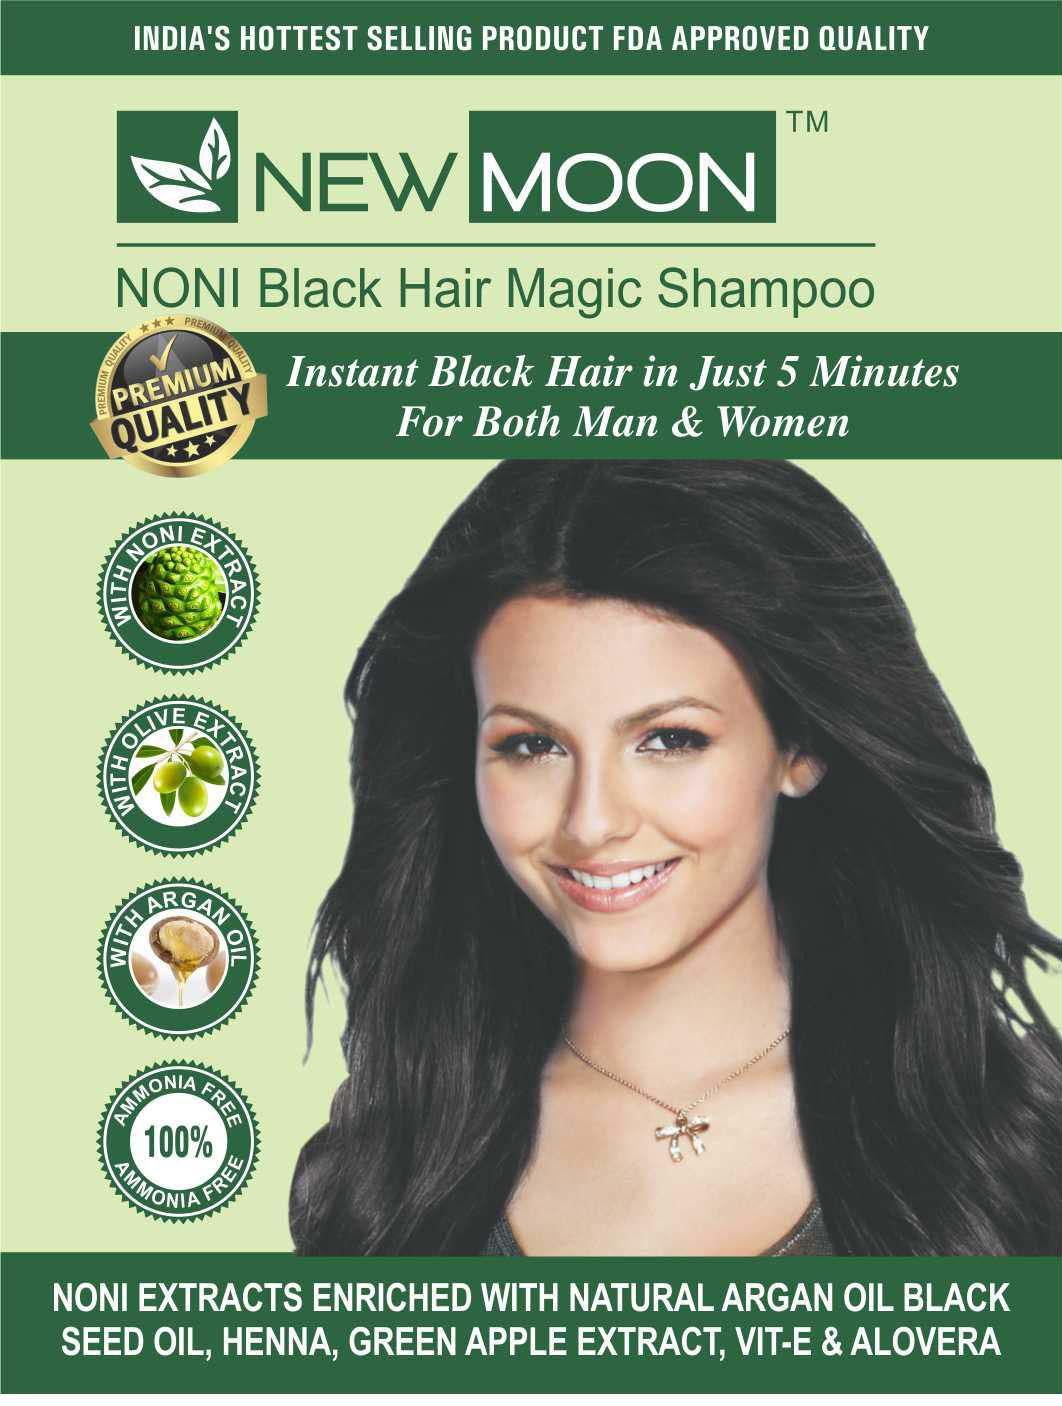 New Moon Noni beard herbal dye Permanent Hair Color Black 30 ml Pack of 10